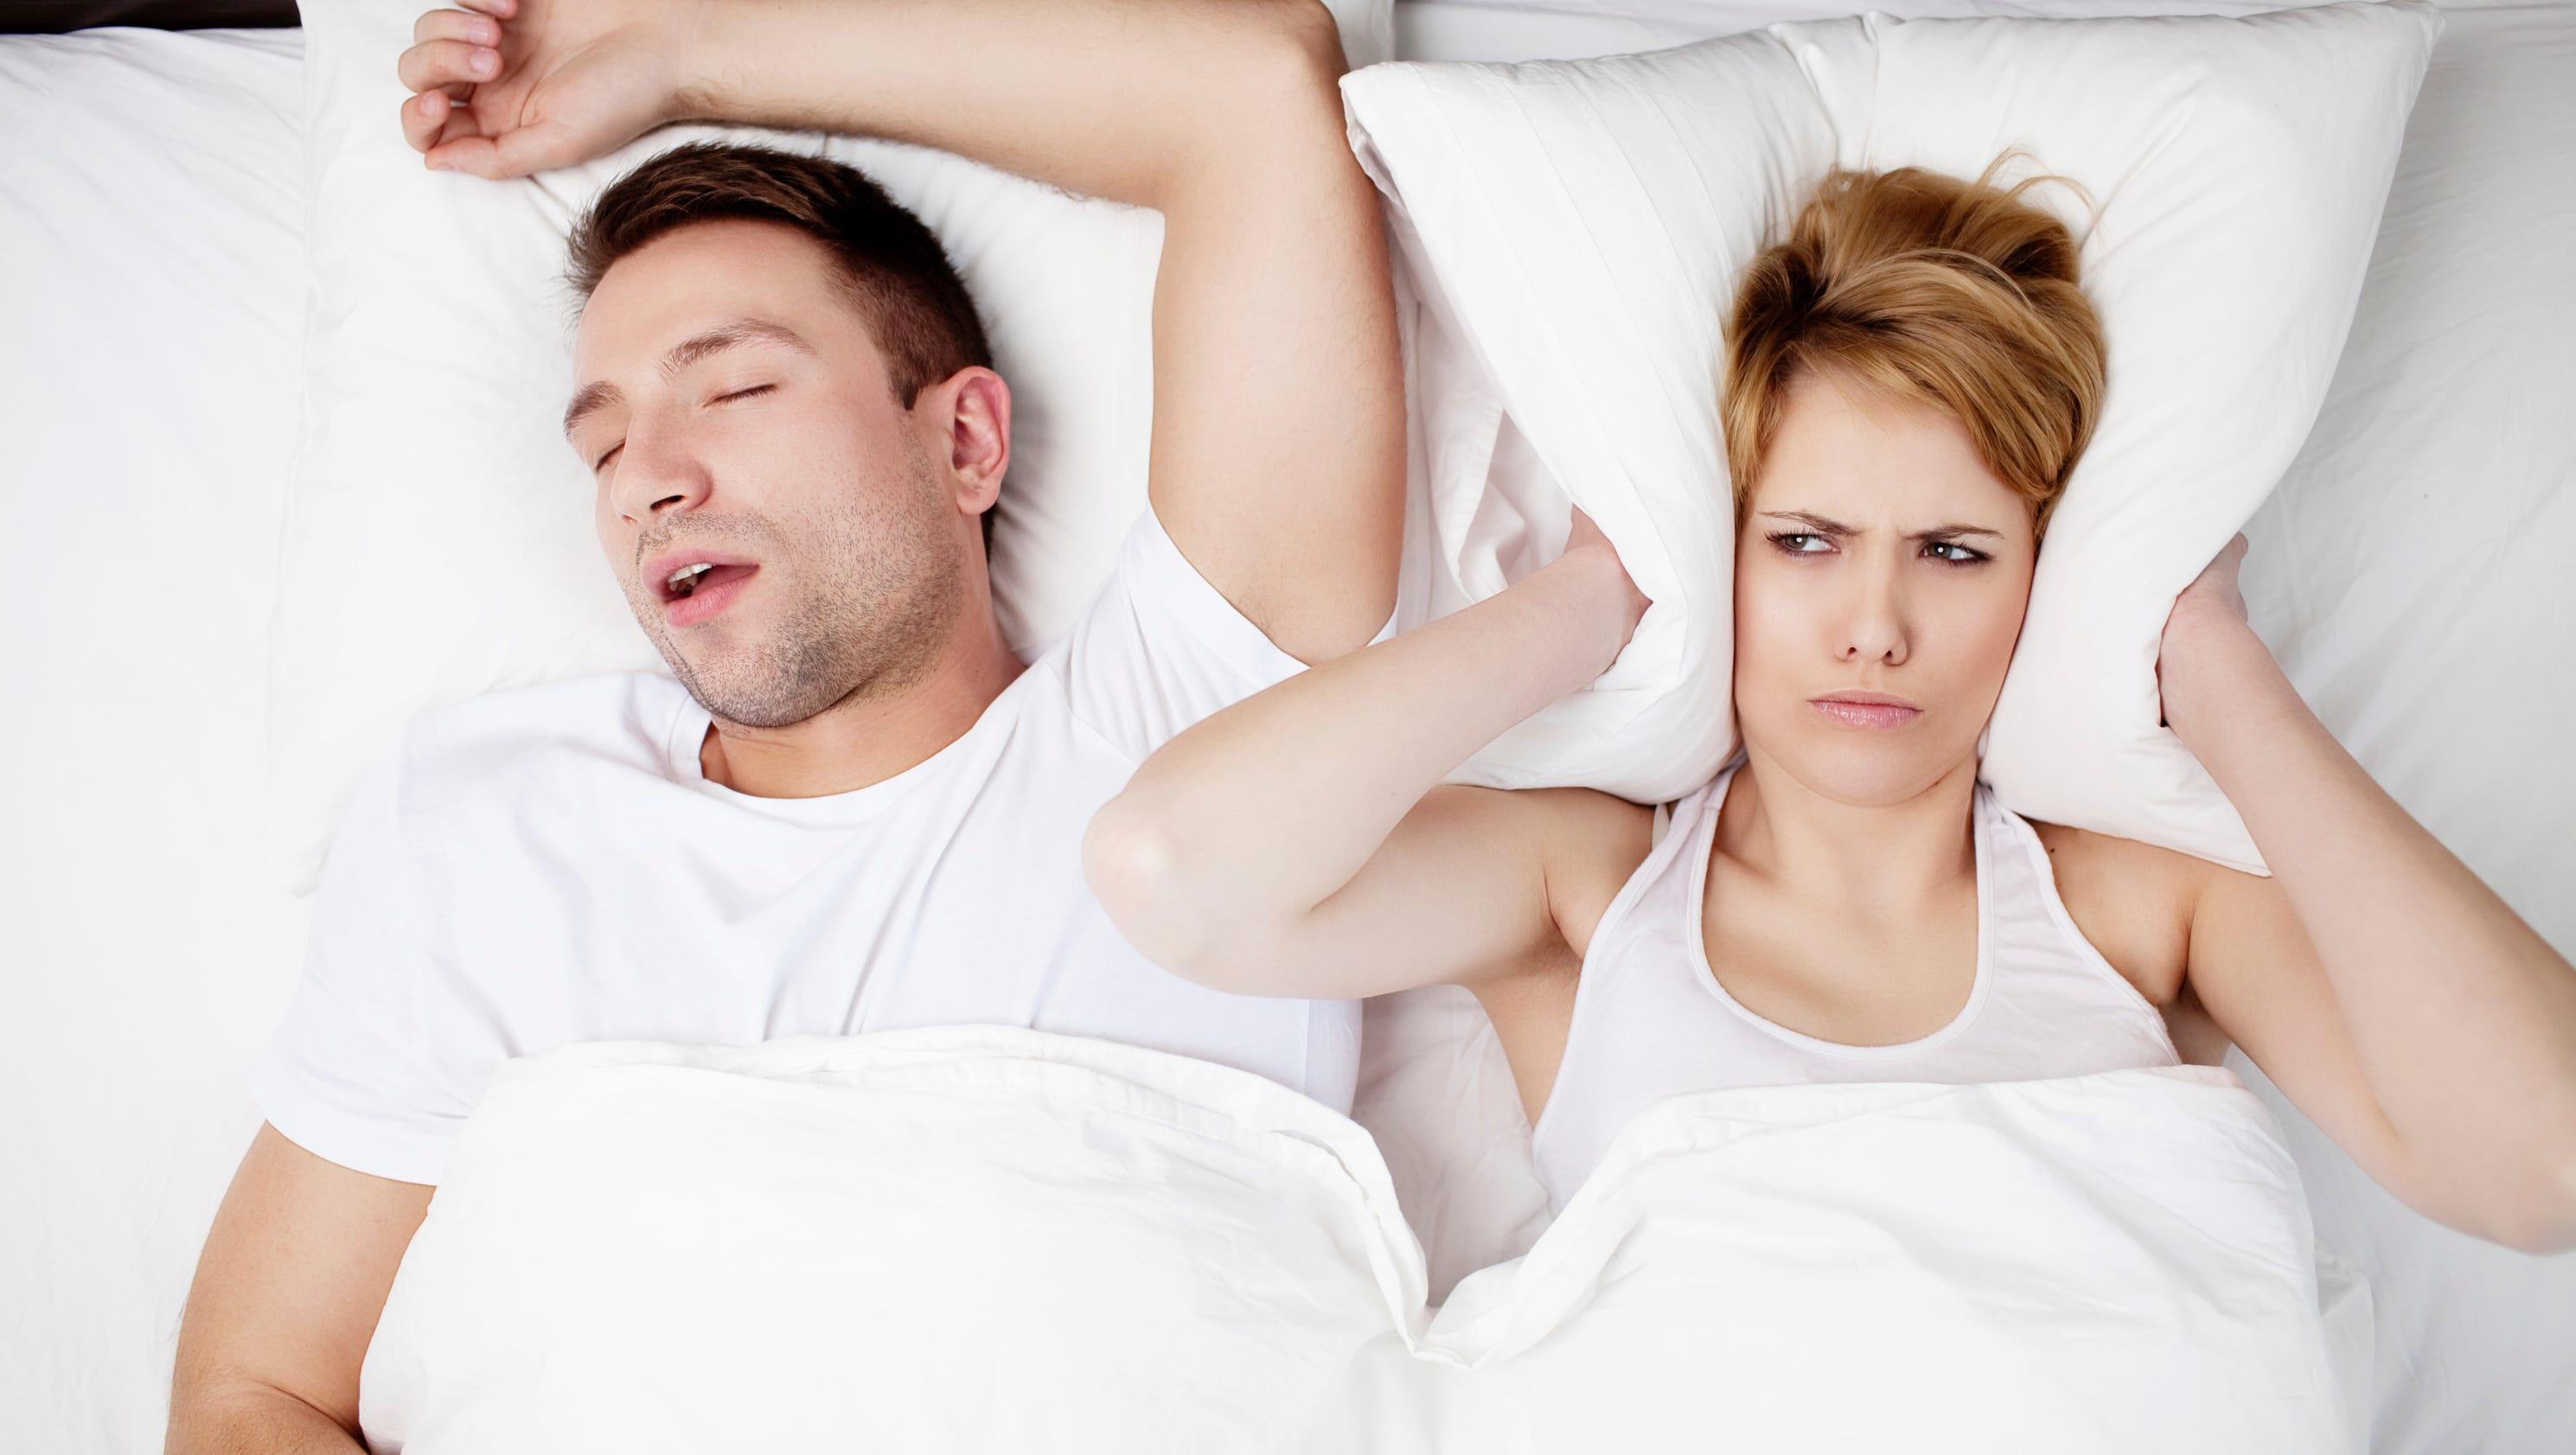 Have sleep apnea? The latest advances might help #85464B